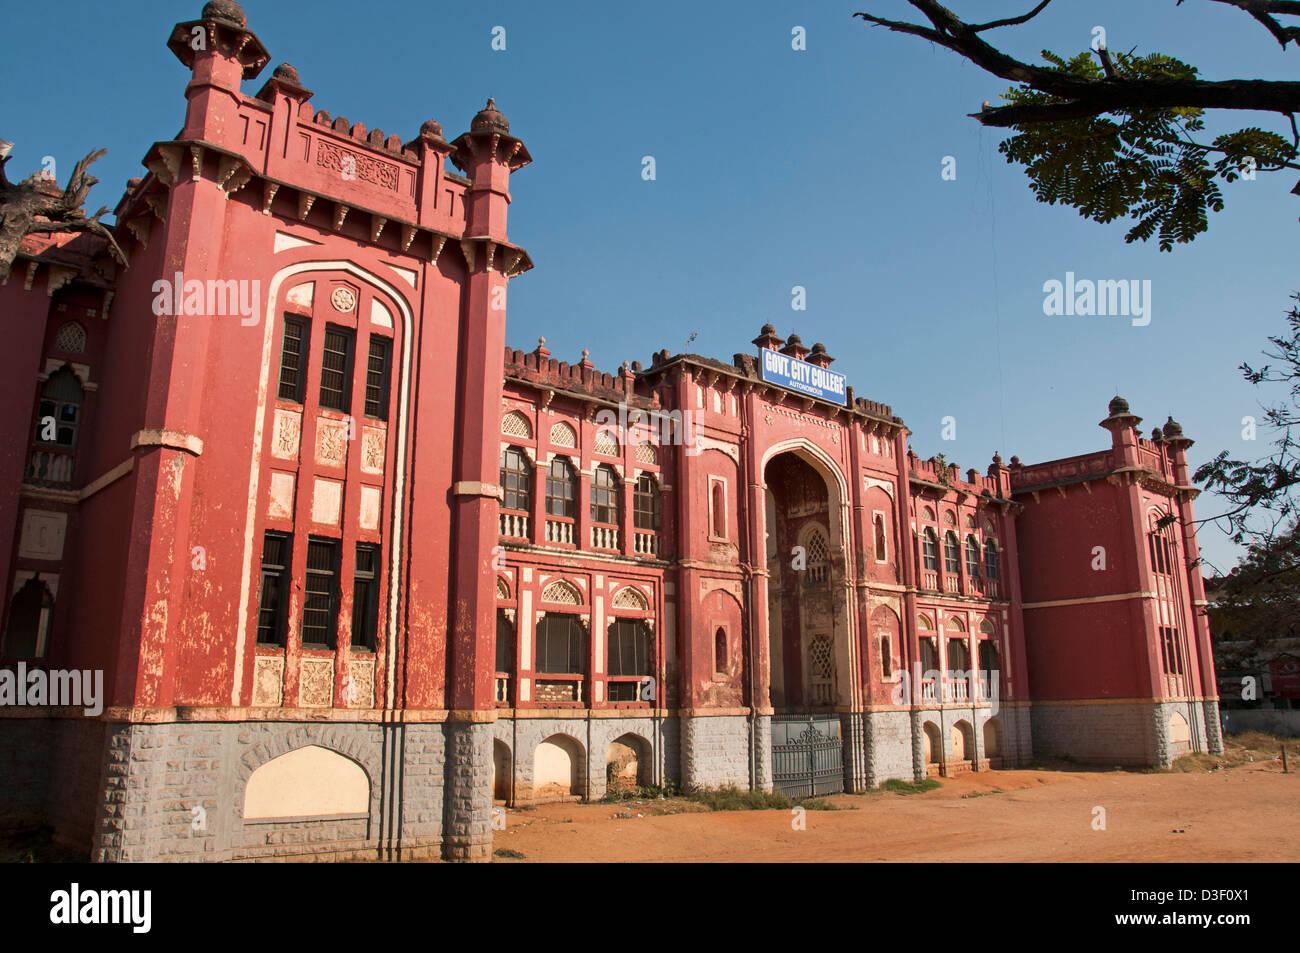 GovernmentCity College Autonomous Hyderabad India Andhra Pradesh - Stock Image